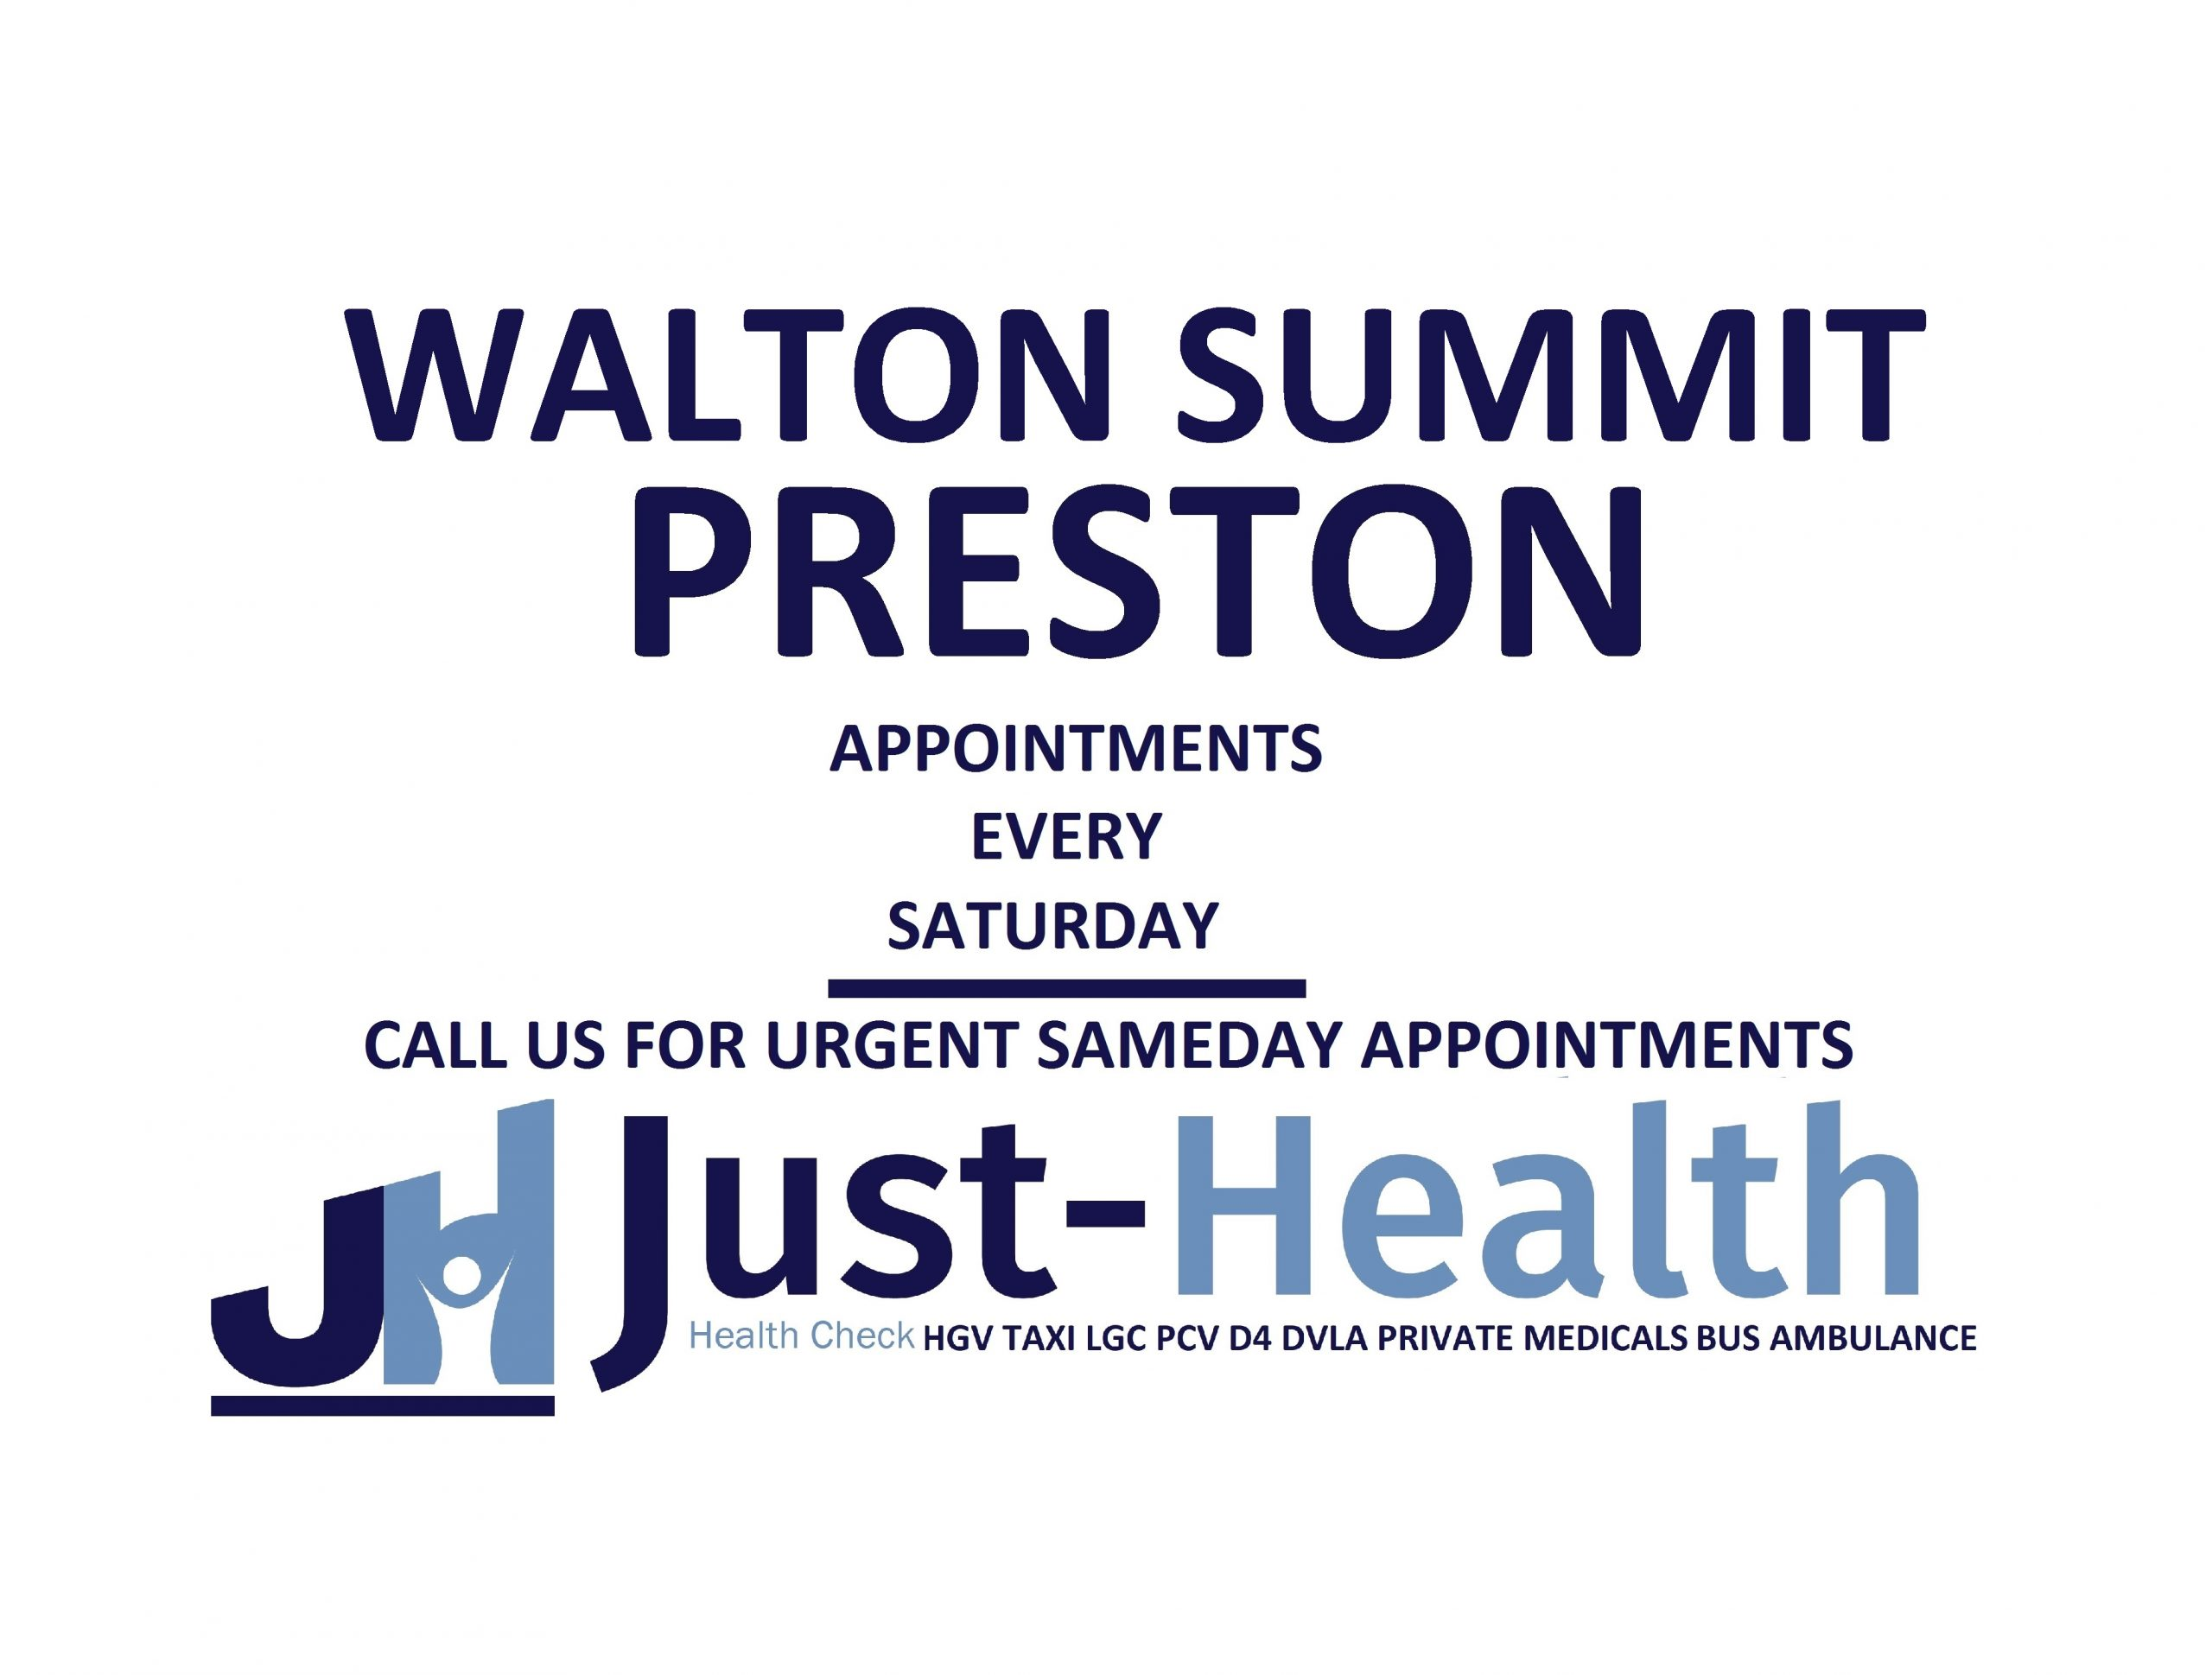 d4 PSV LGV Taxi Pcv HGV medical just health clinic walton summit preston lancashire